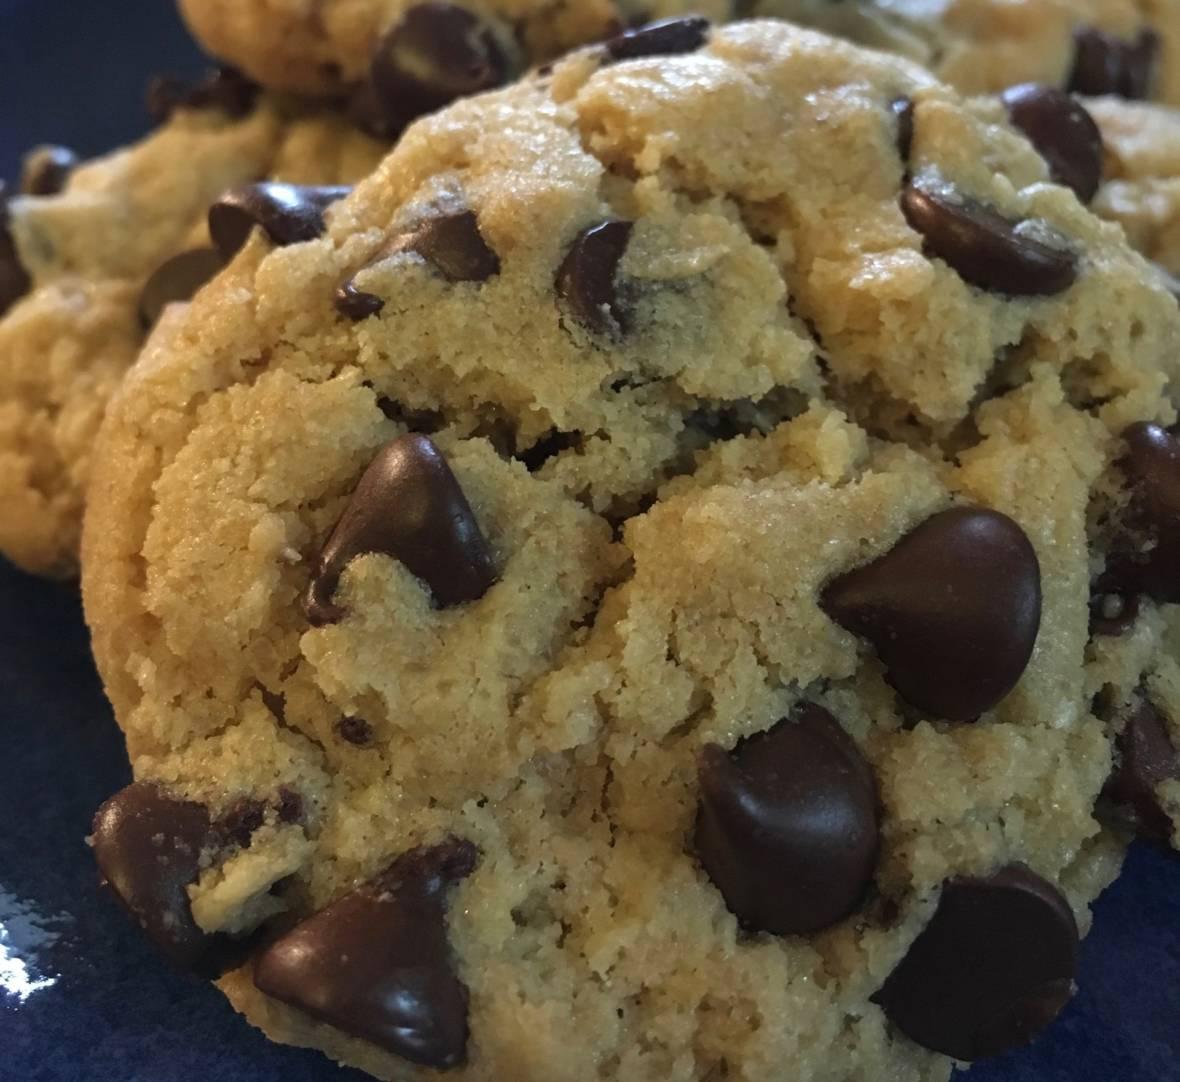 Why Burlingame Smells Like Chocolate